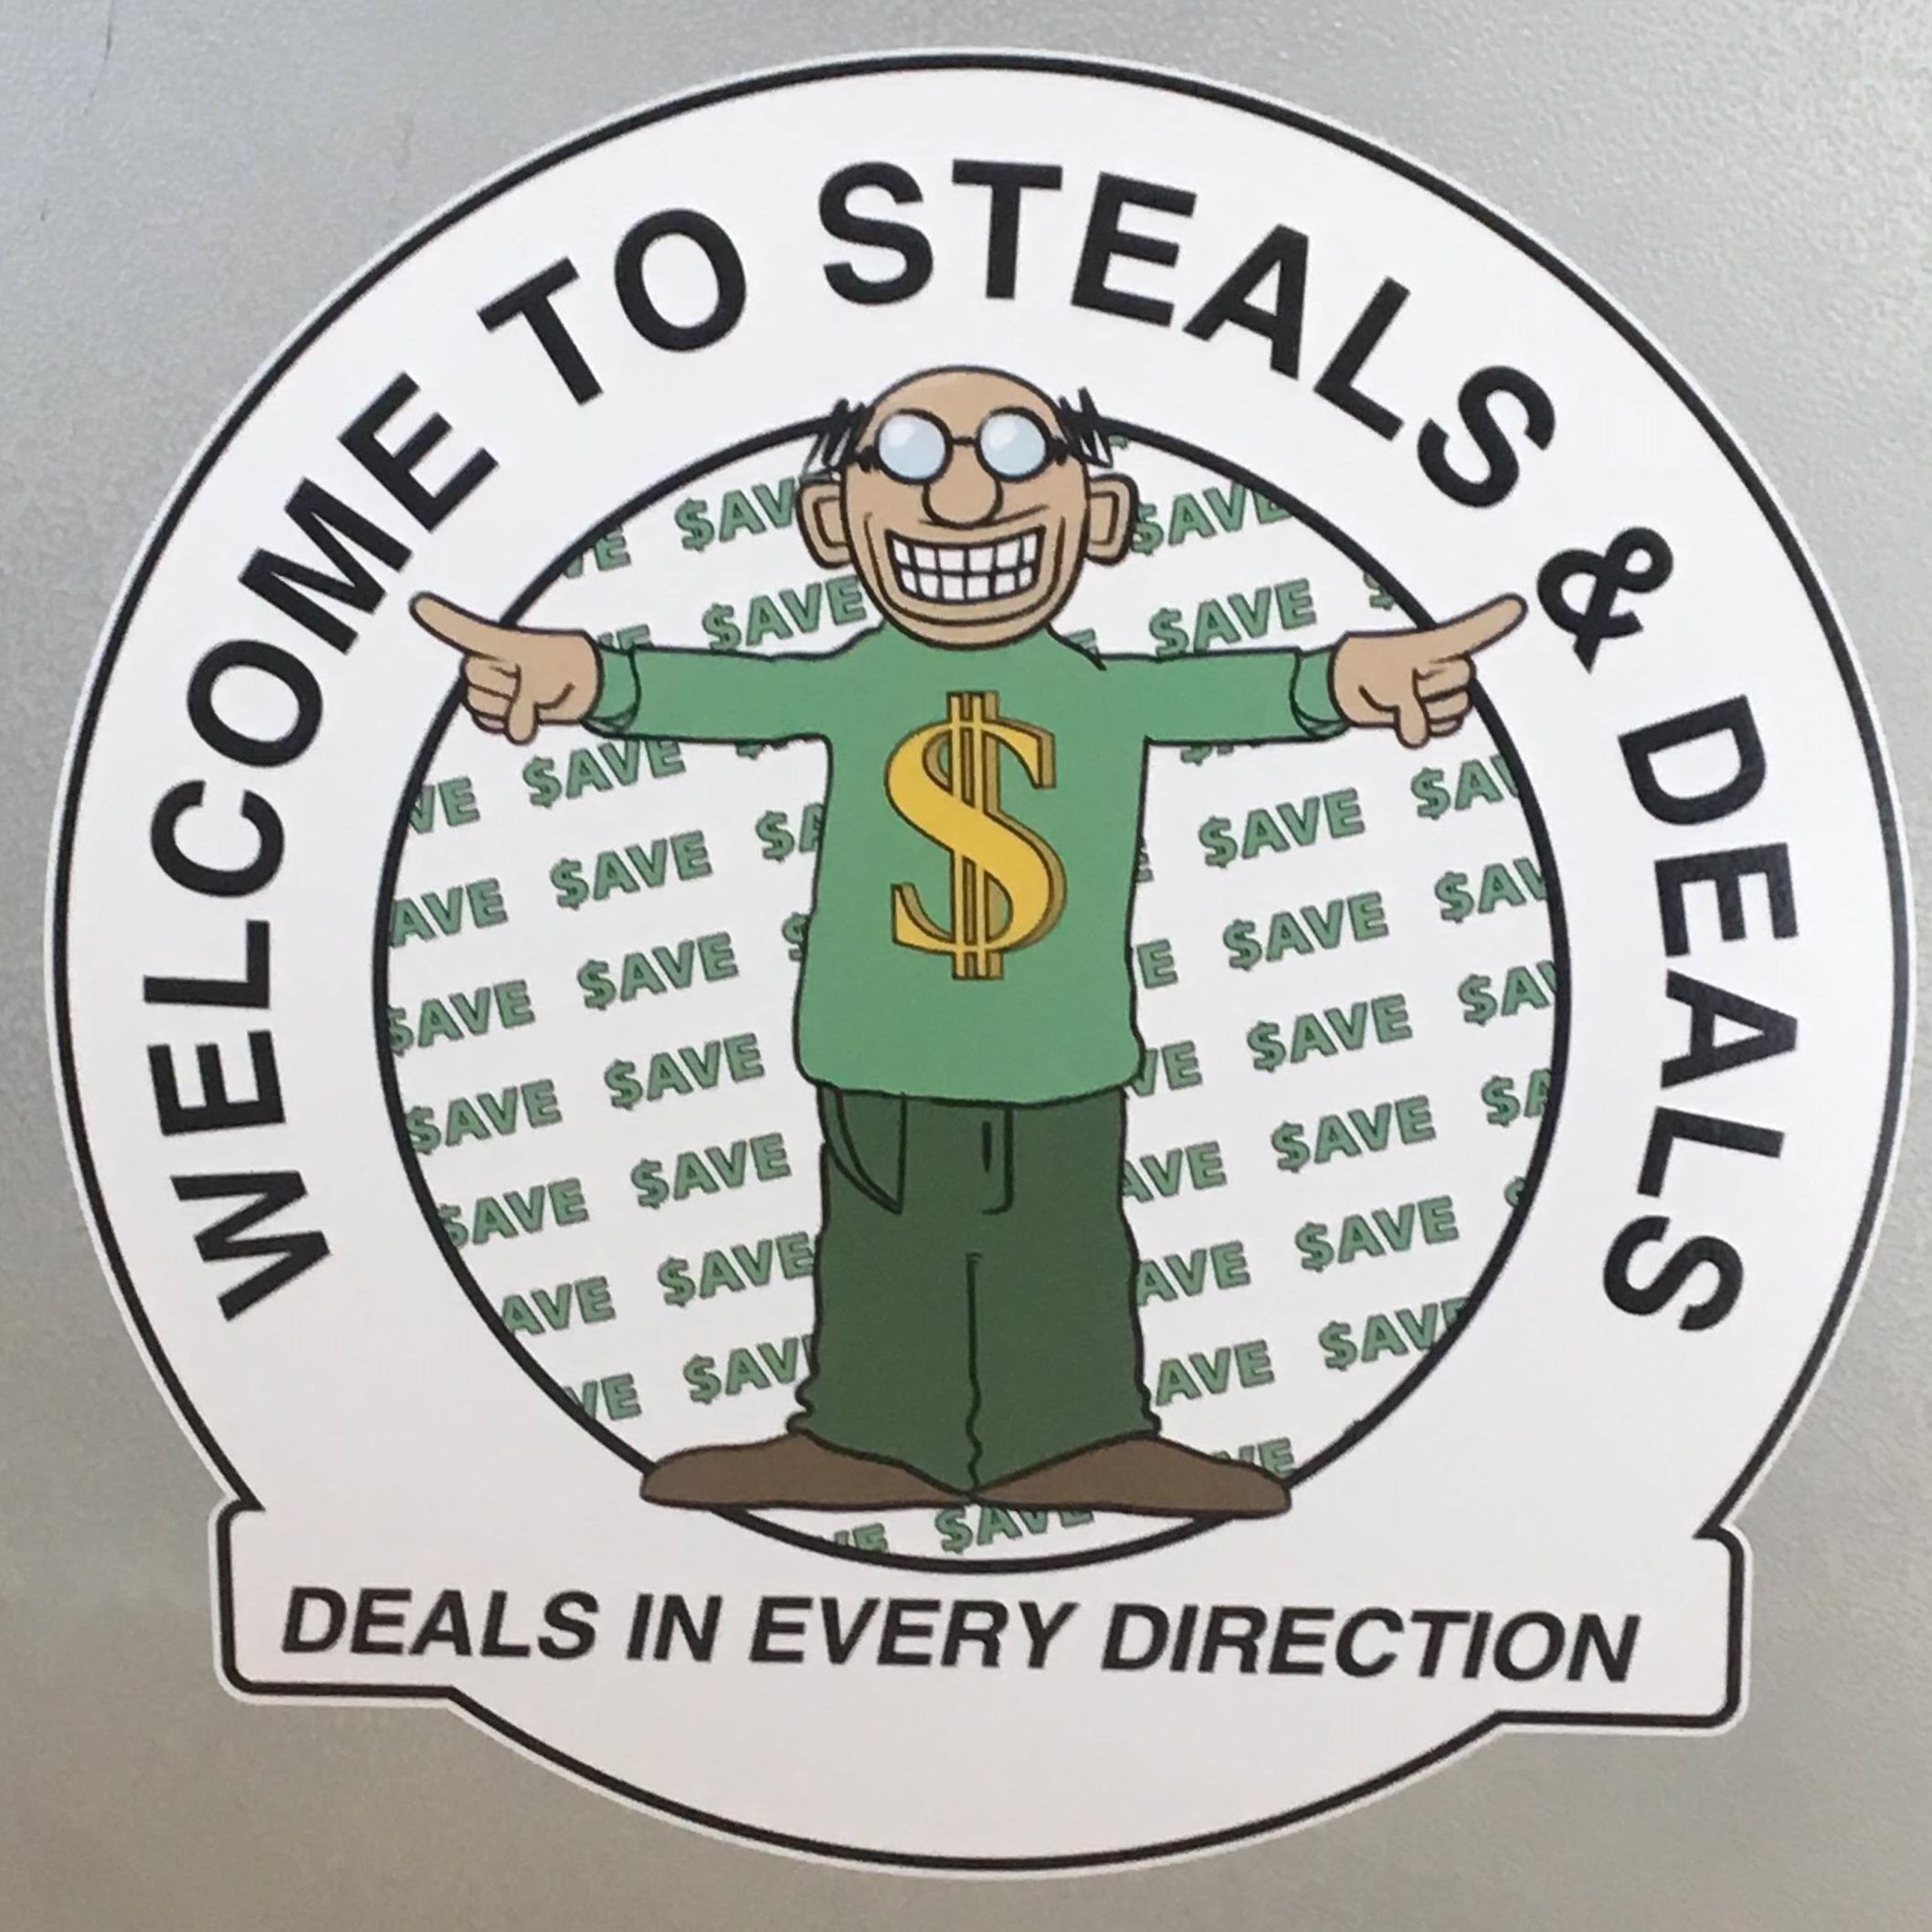 Steals & Deals